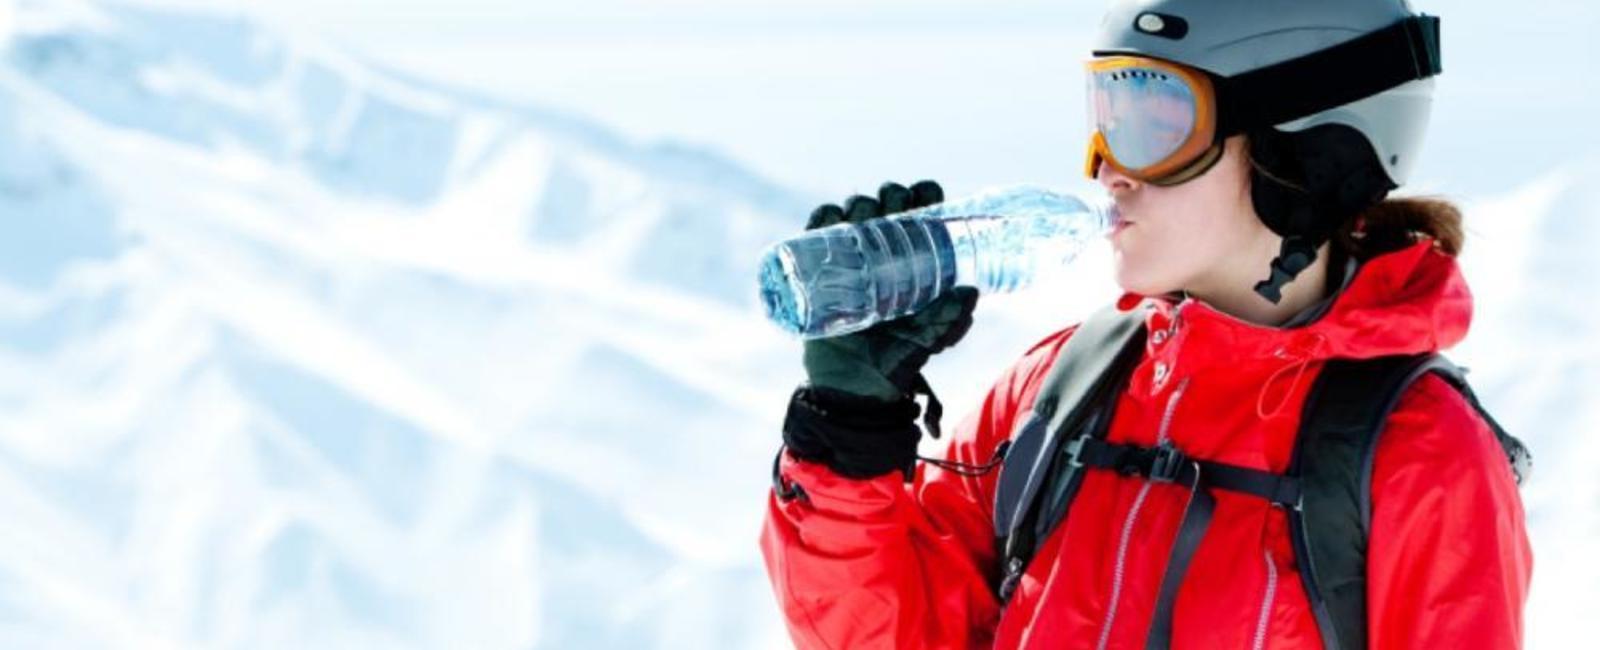 How to Avoid Altitude Sickness on Your Next Ski Trip